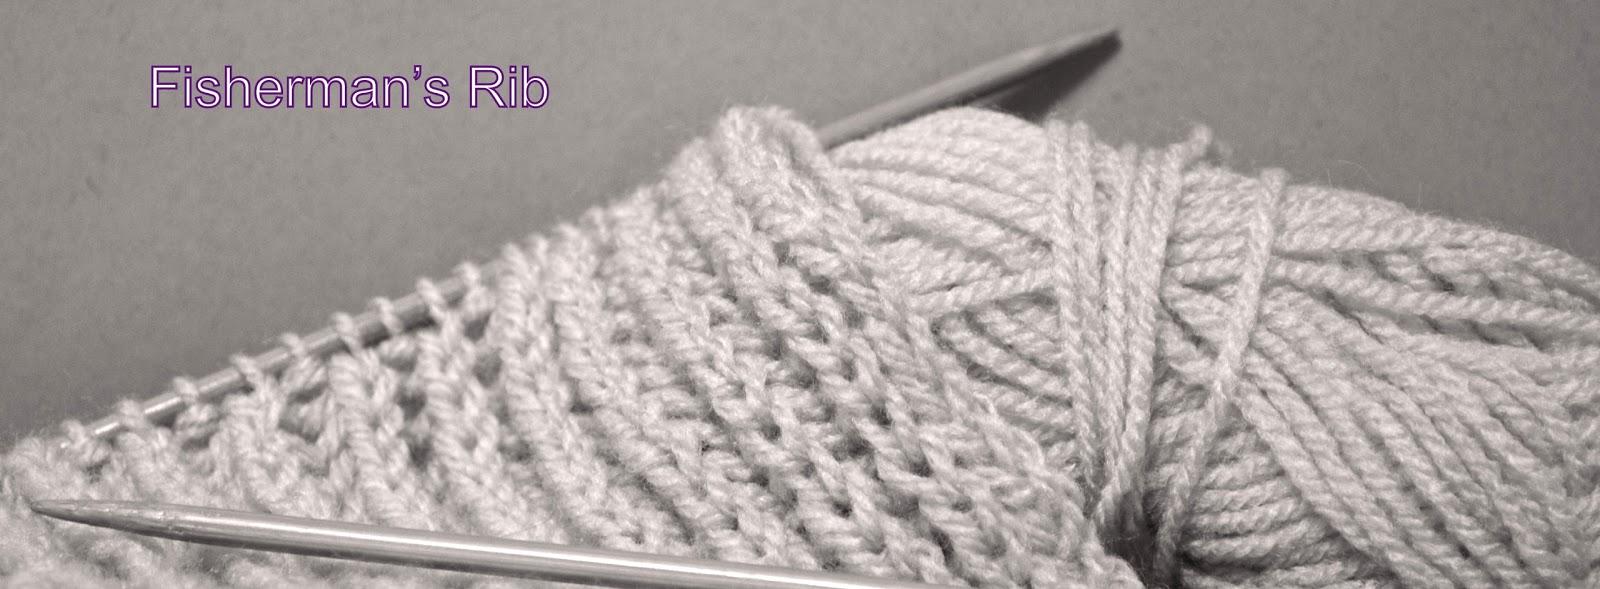 Knitting Stitches Fisherman s Rib : Knitting Novice: The Weekly Swatch: Fishermans Rib Stitch